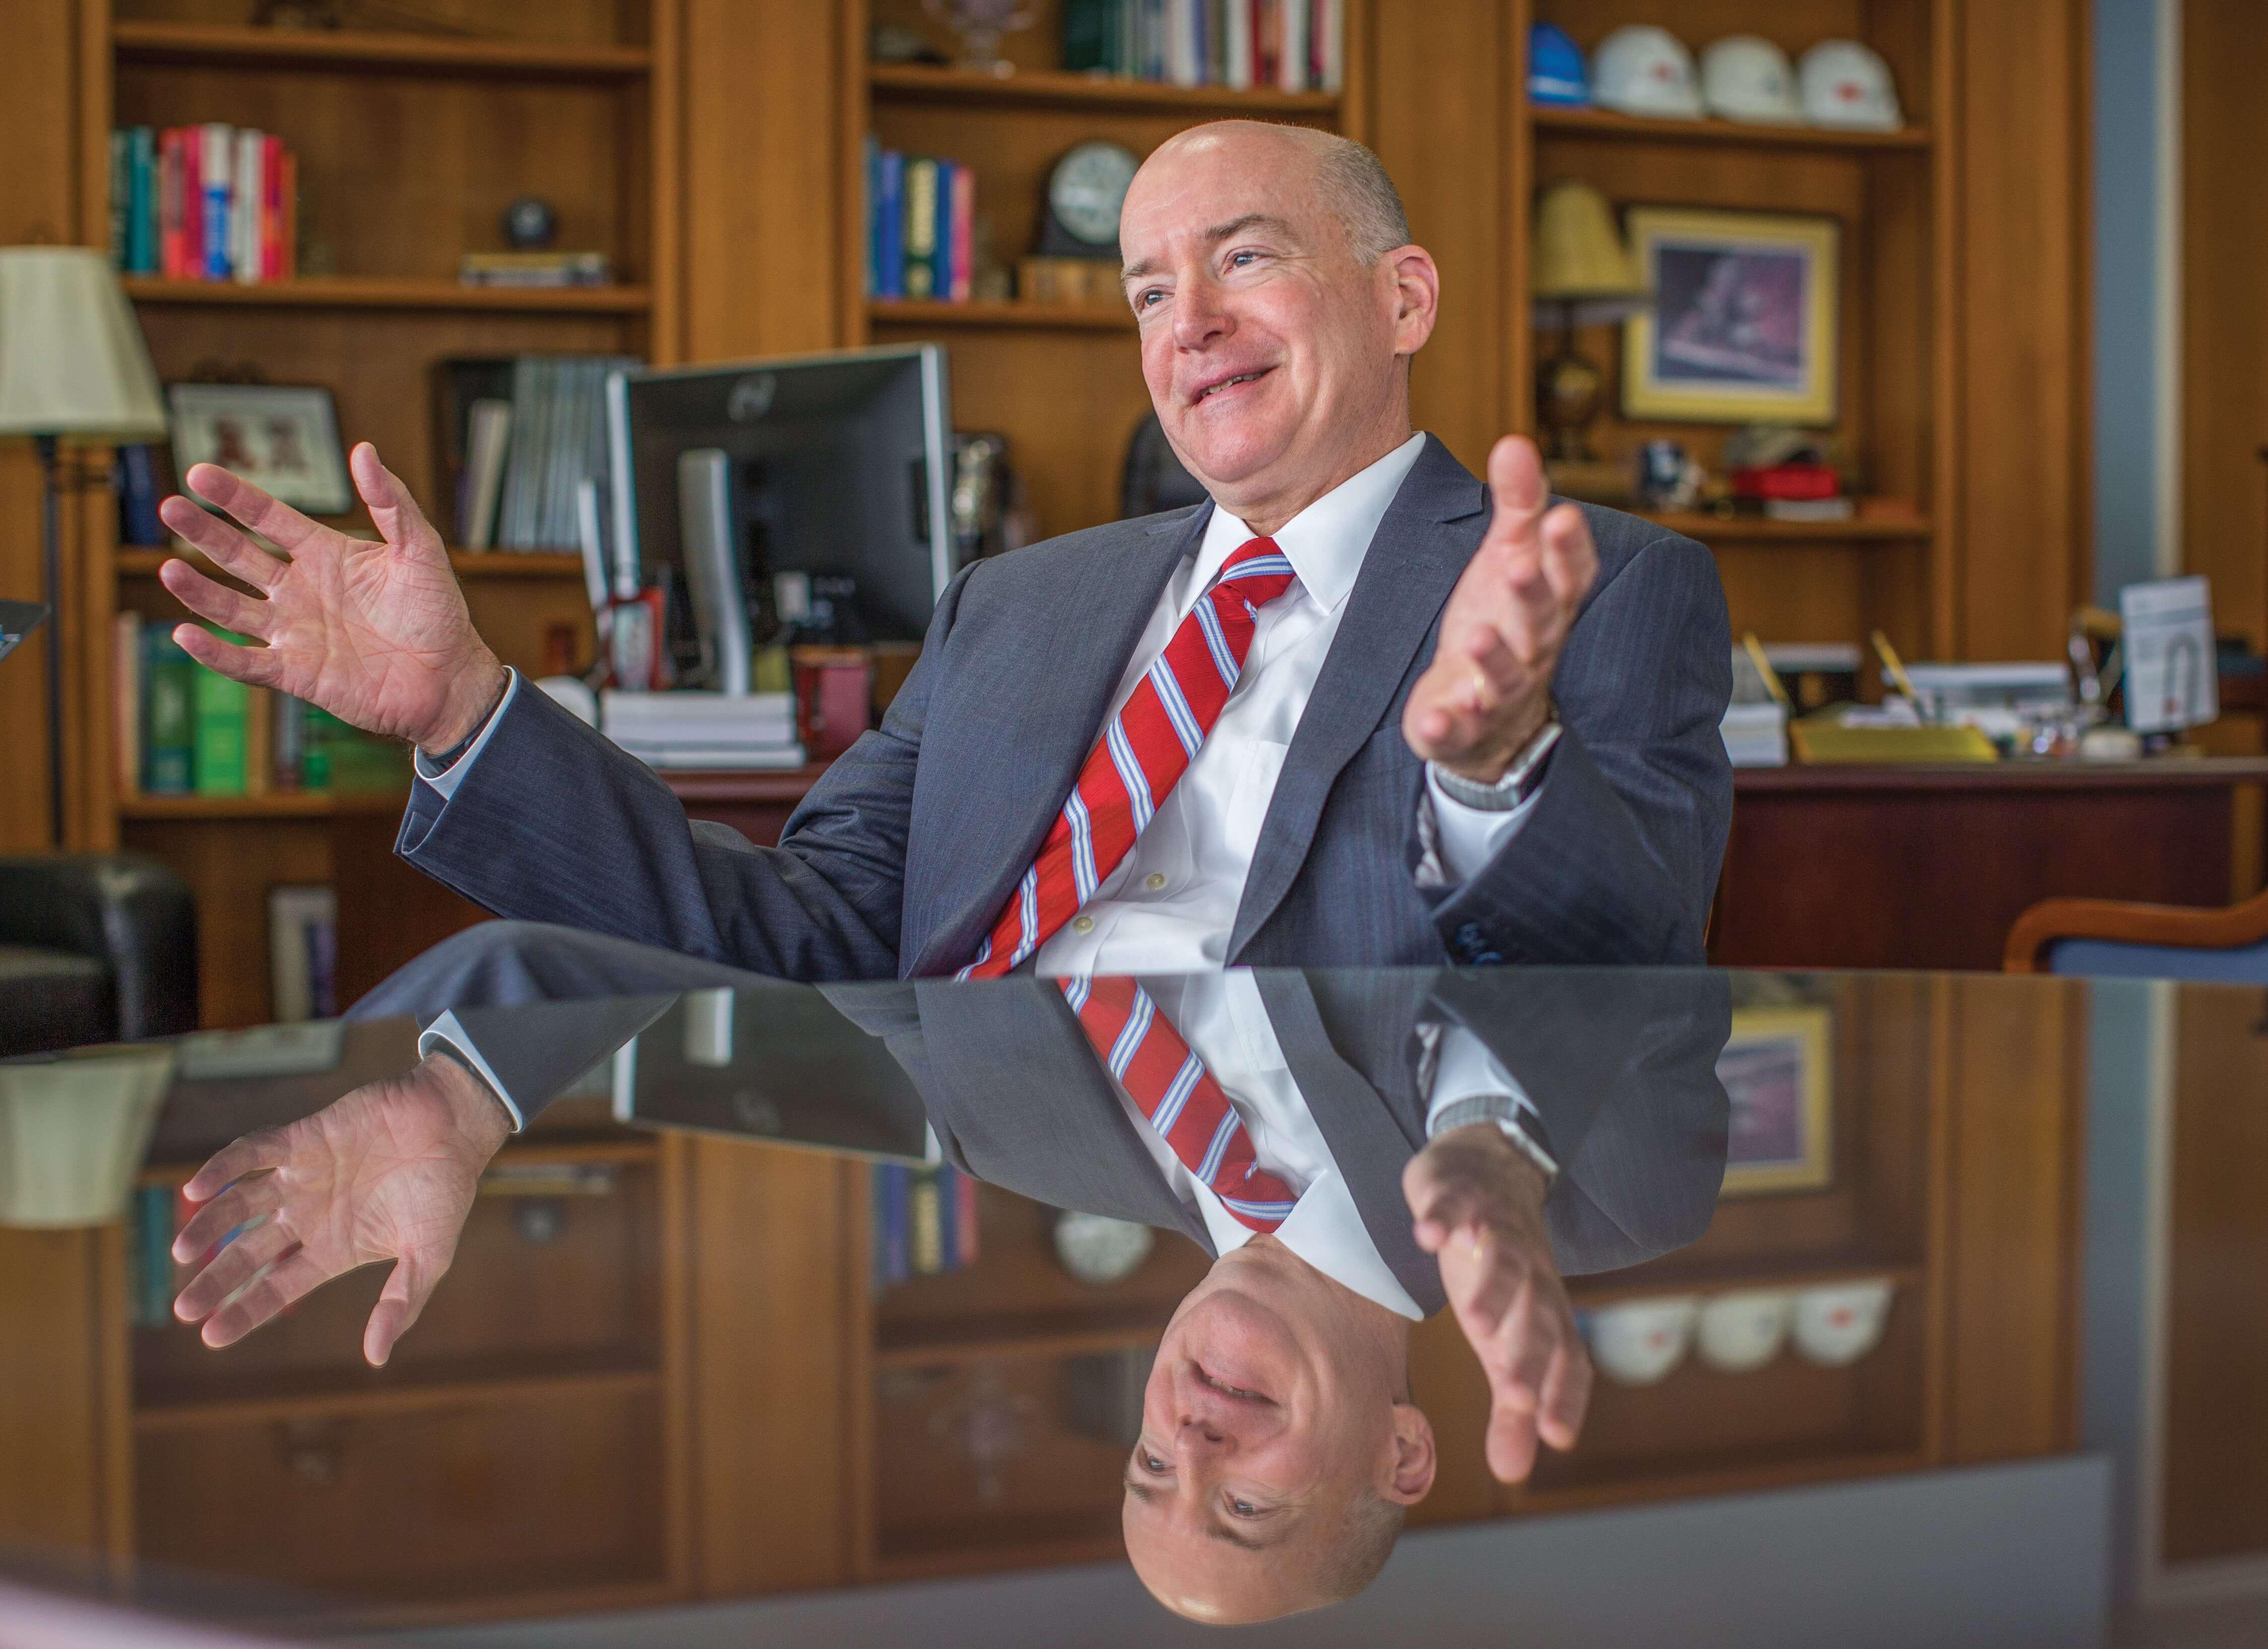 David L. Callender, M.D., in 2016 as president of the University of Texas Medical Branch at Galveston. (Credit: Nick de la Torre)